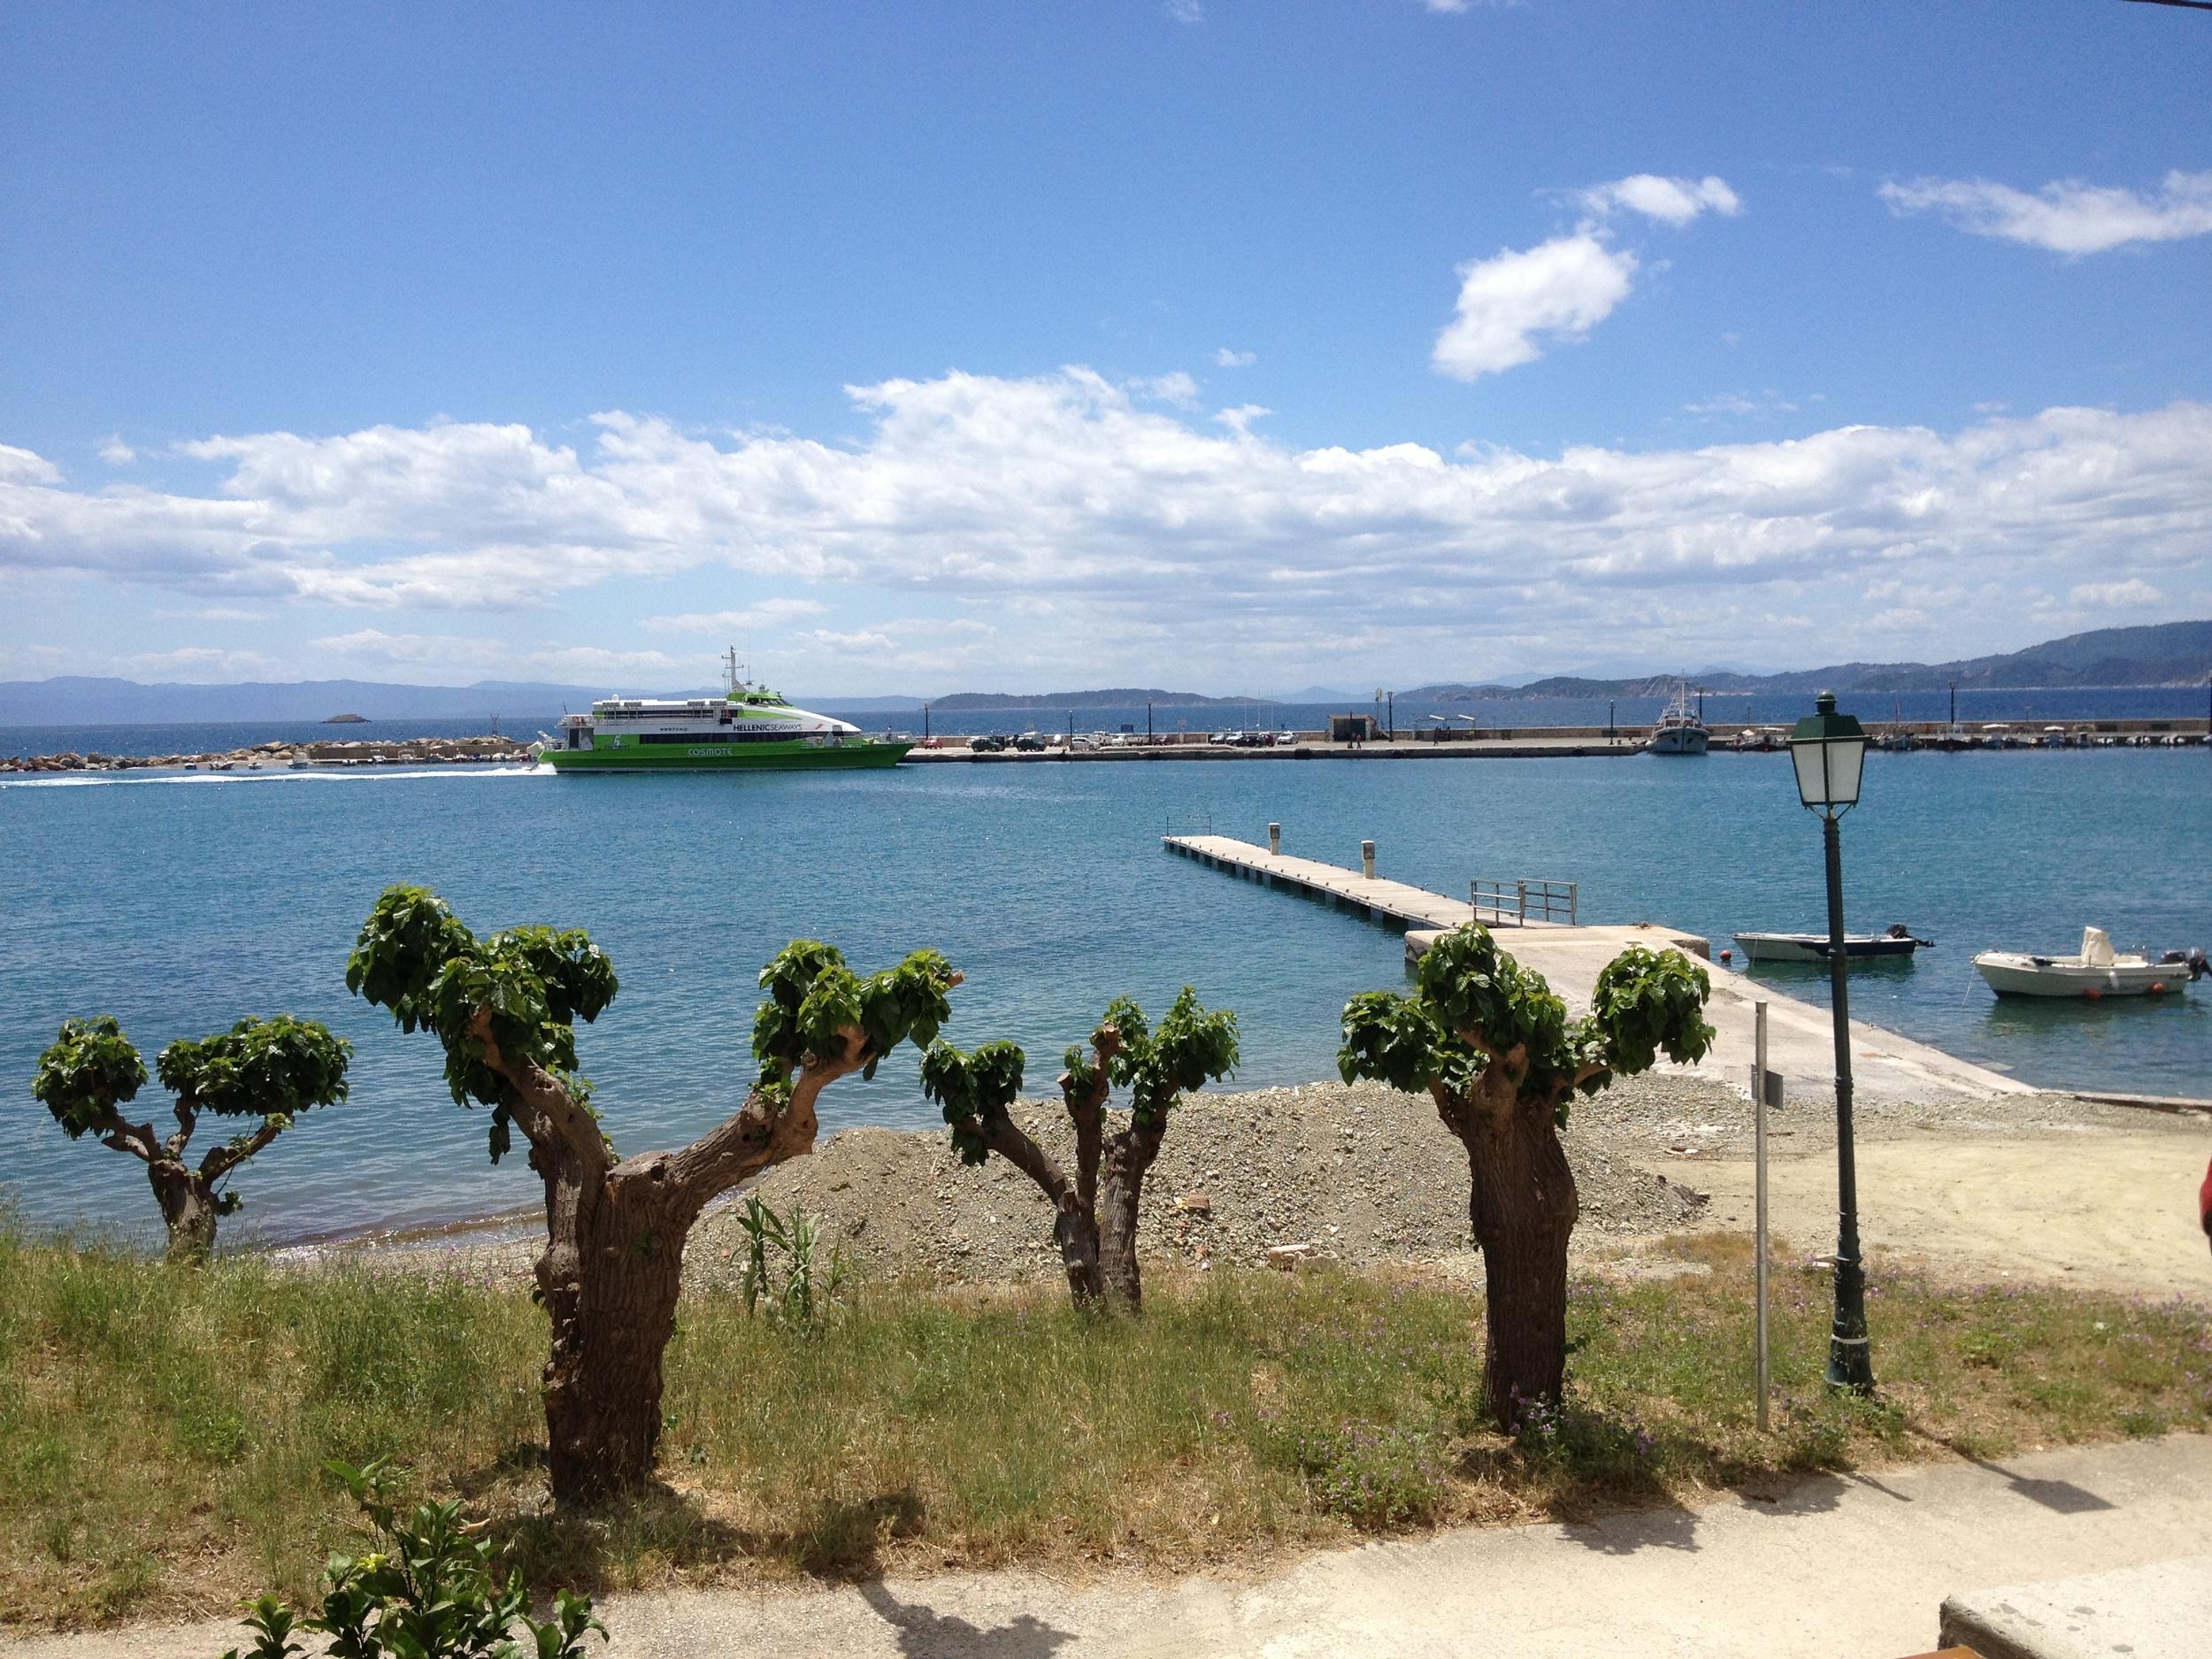 Catamaran Arrives - From Petrinos.JPG